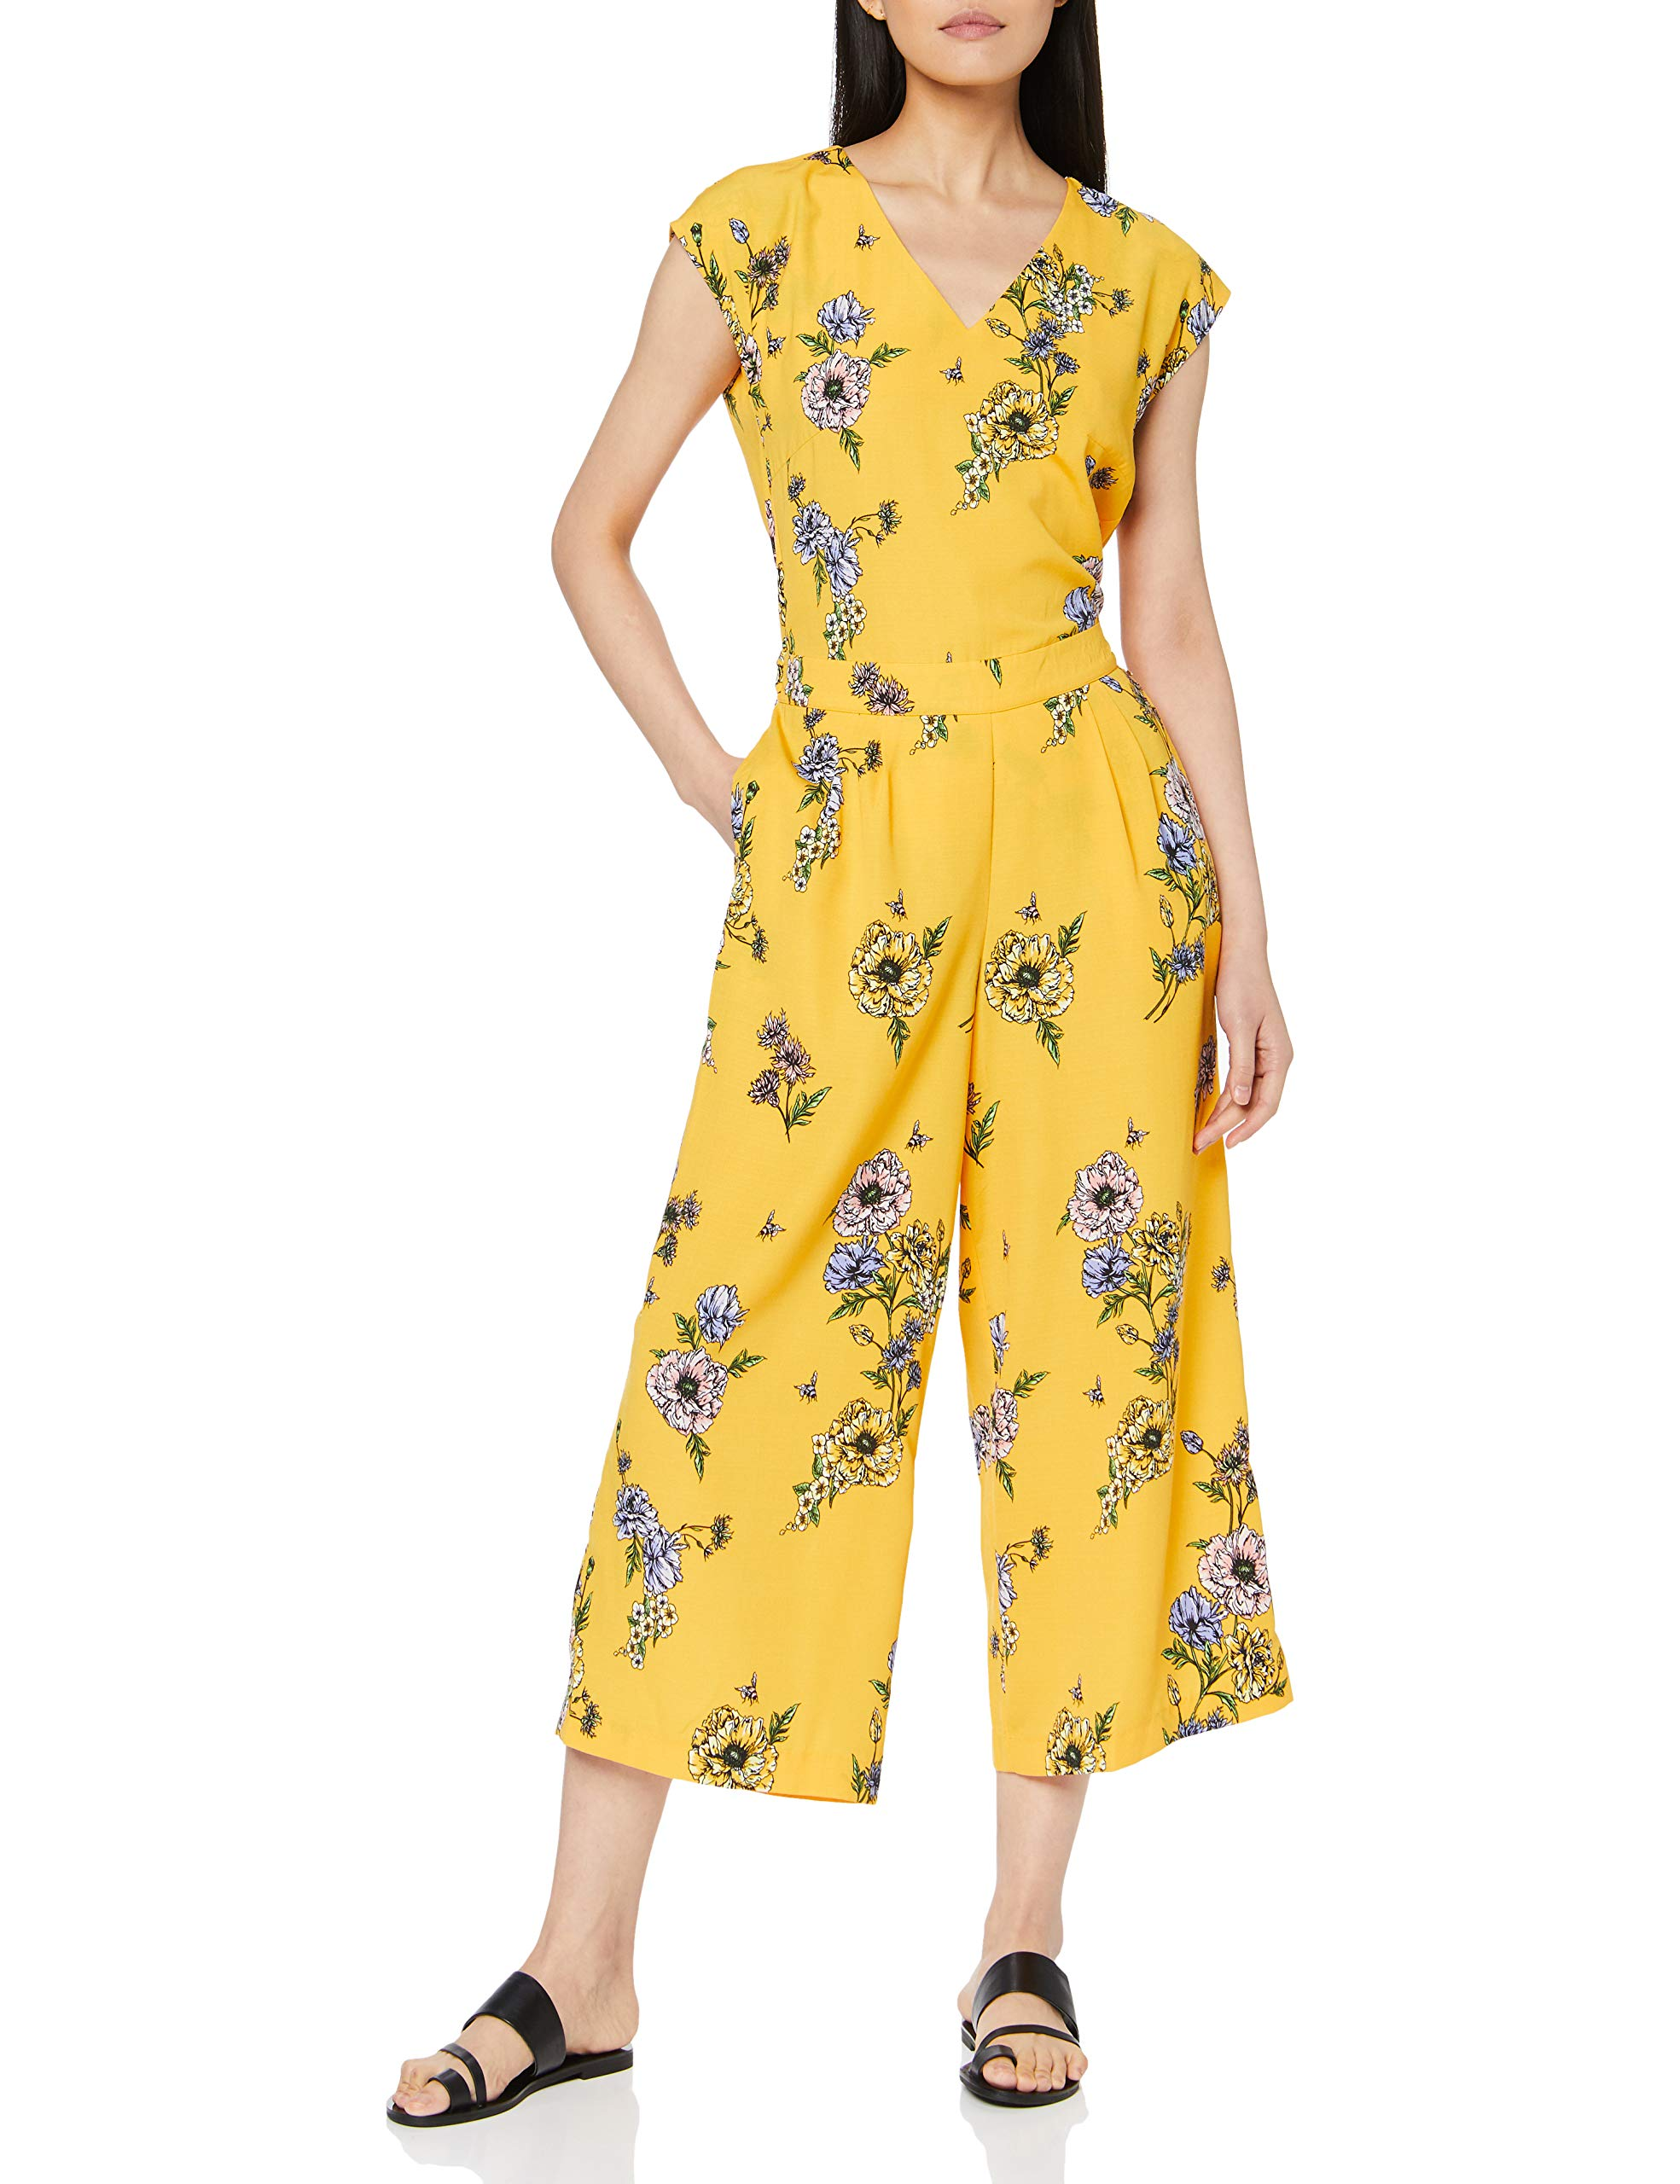 Tom Overa Femme Wrap Flower Print Tailor Culotte 17561S CombinaisonJauneyellow Denim E9YHDI2W